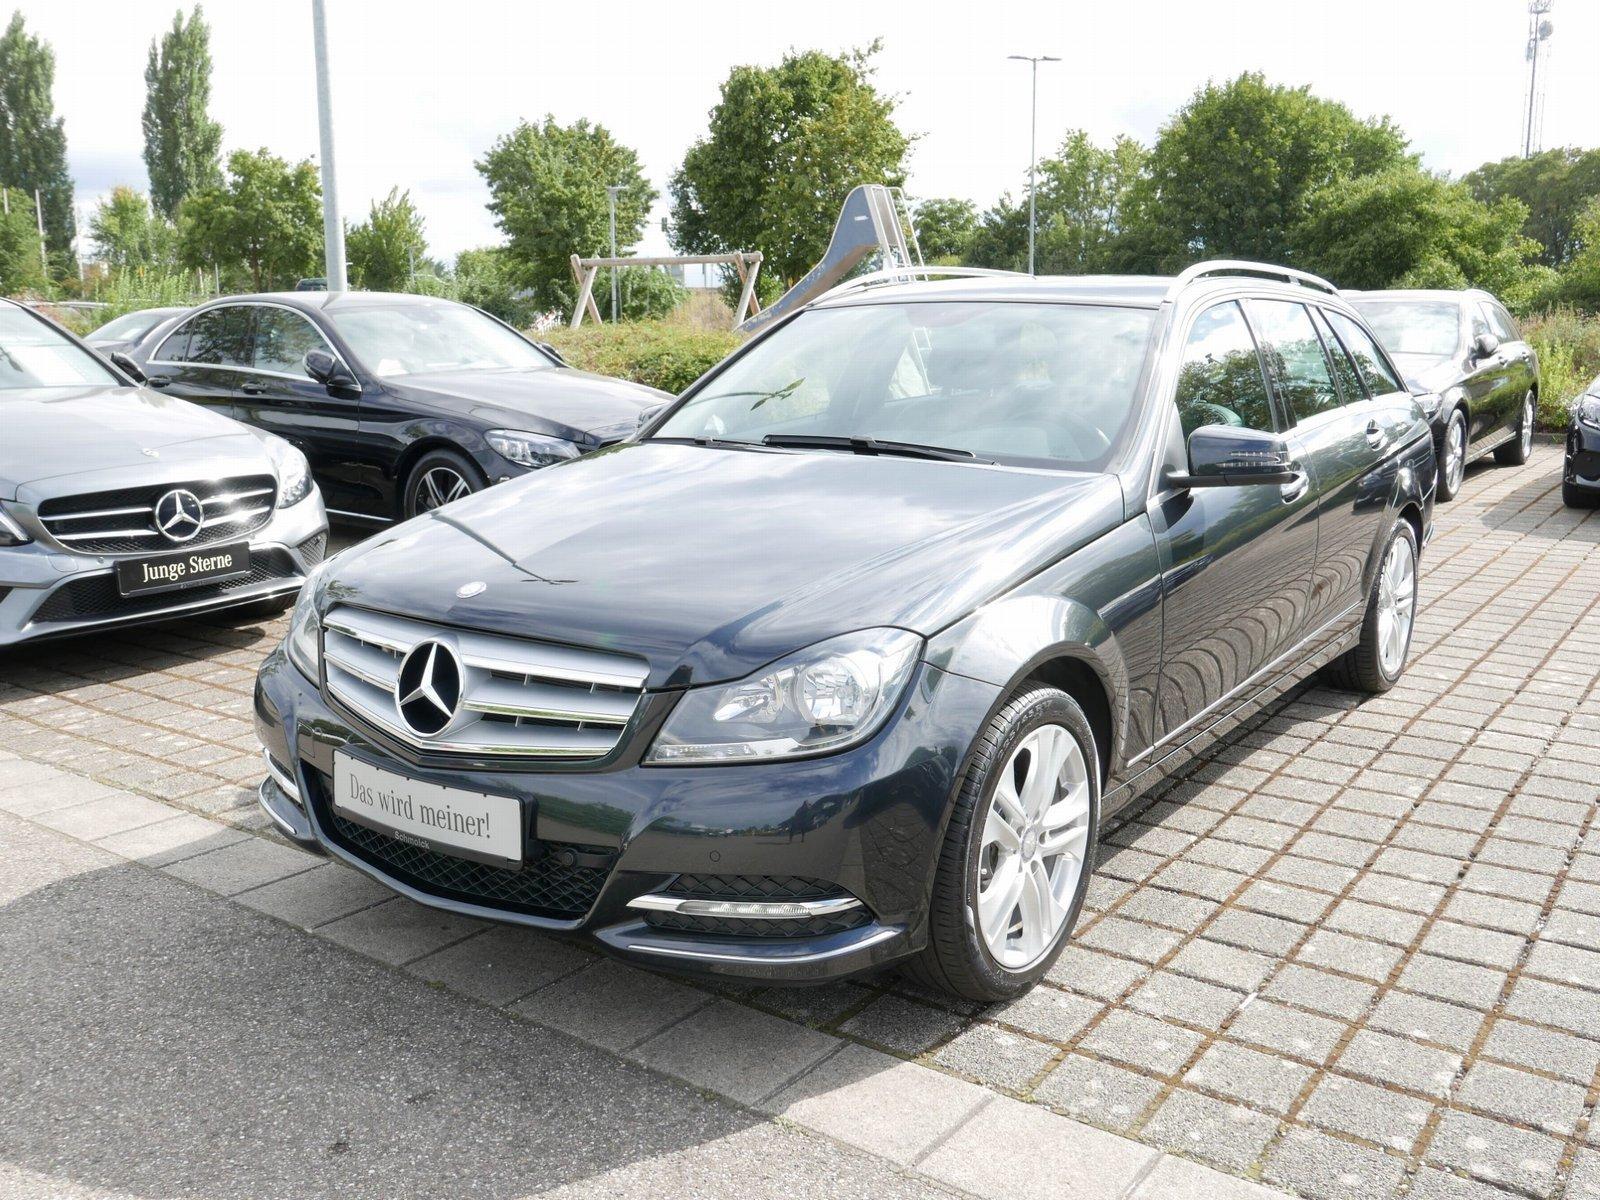 Mercedes-Benz C 180 T AVANTGARDE/NAVI/PTS/SHZ/EASY-P/TEMPOMAT, Jahr 2013, Benzin